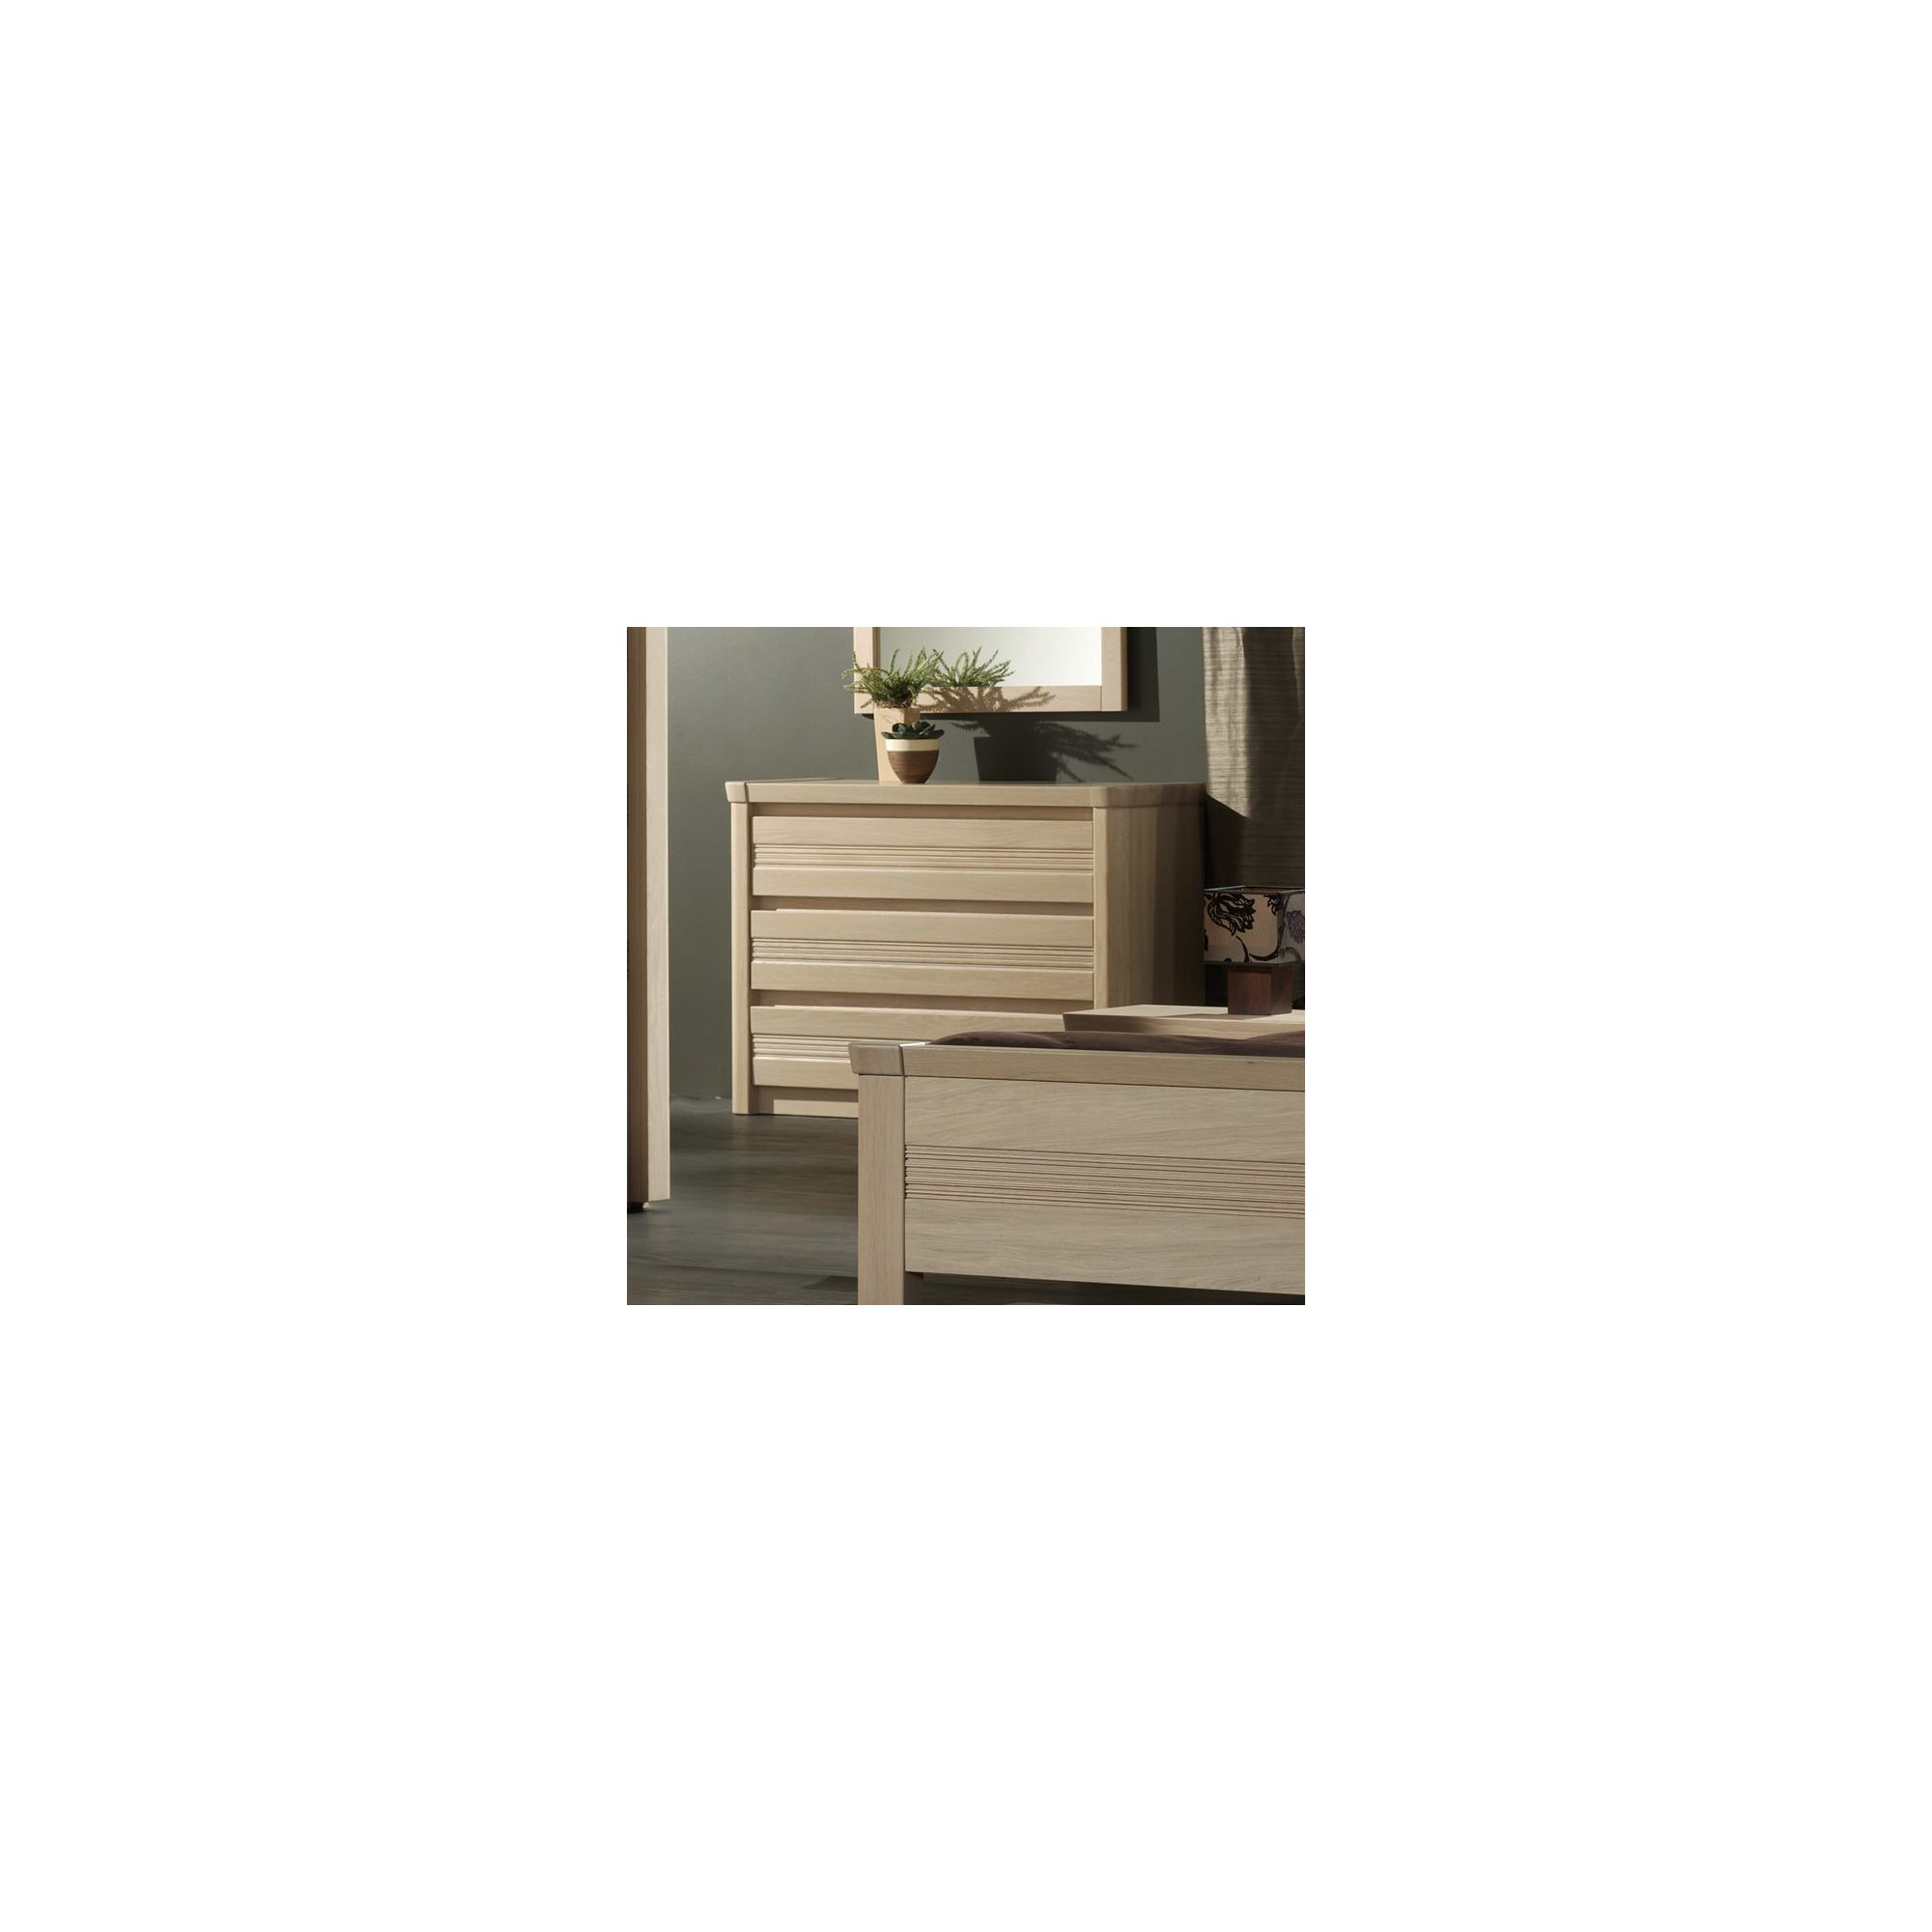 Sleepline Mundo 3 Drawers Chest - White Mat Lacquered at Tesco Direct